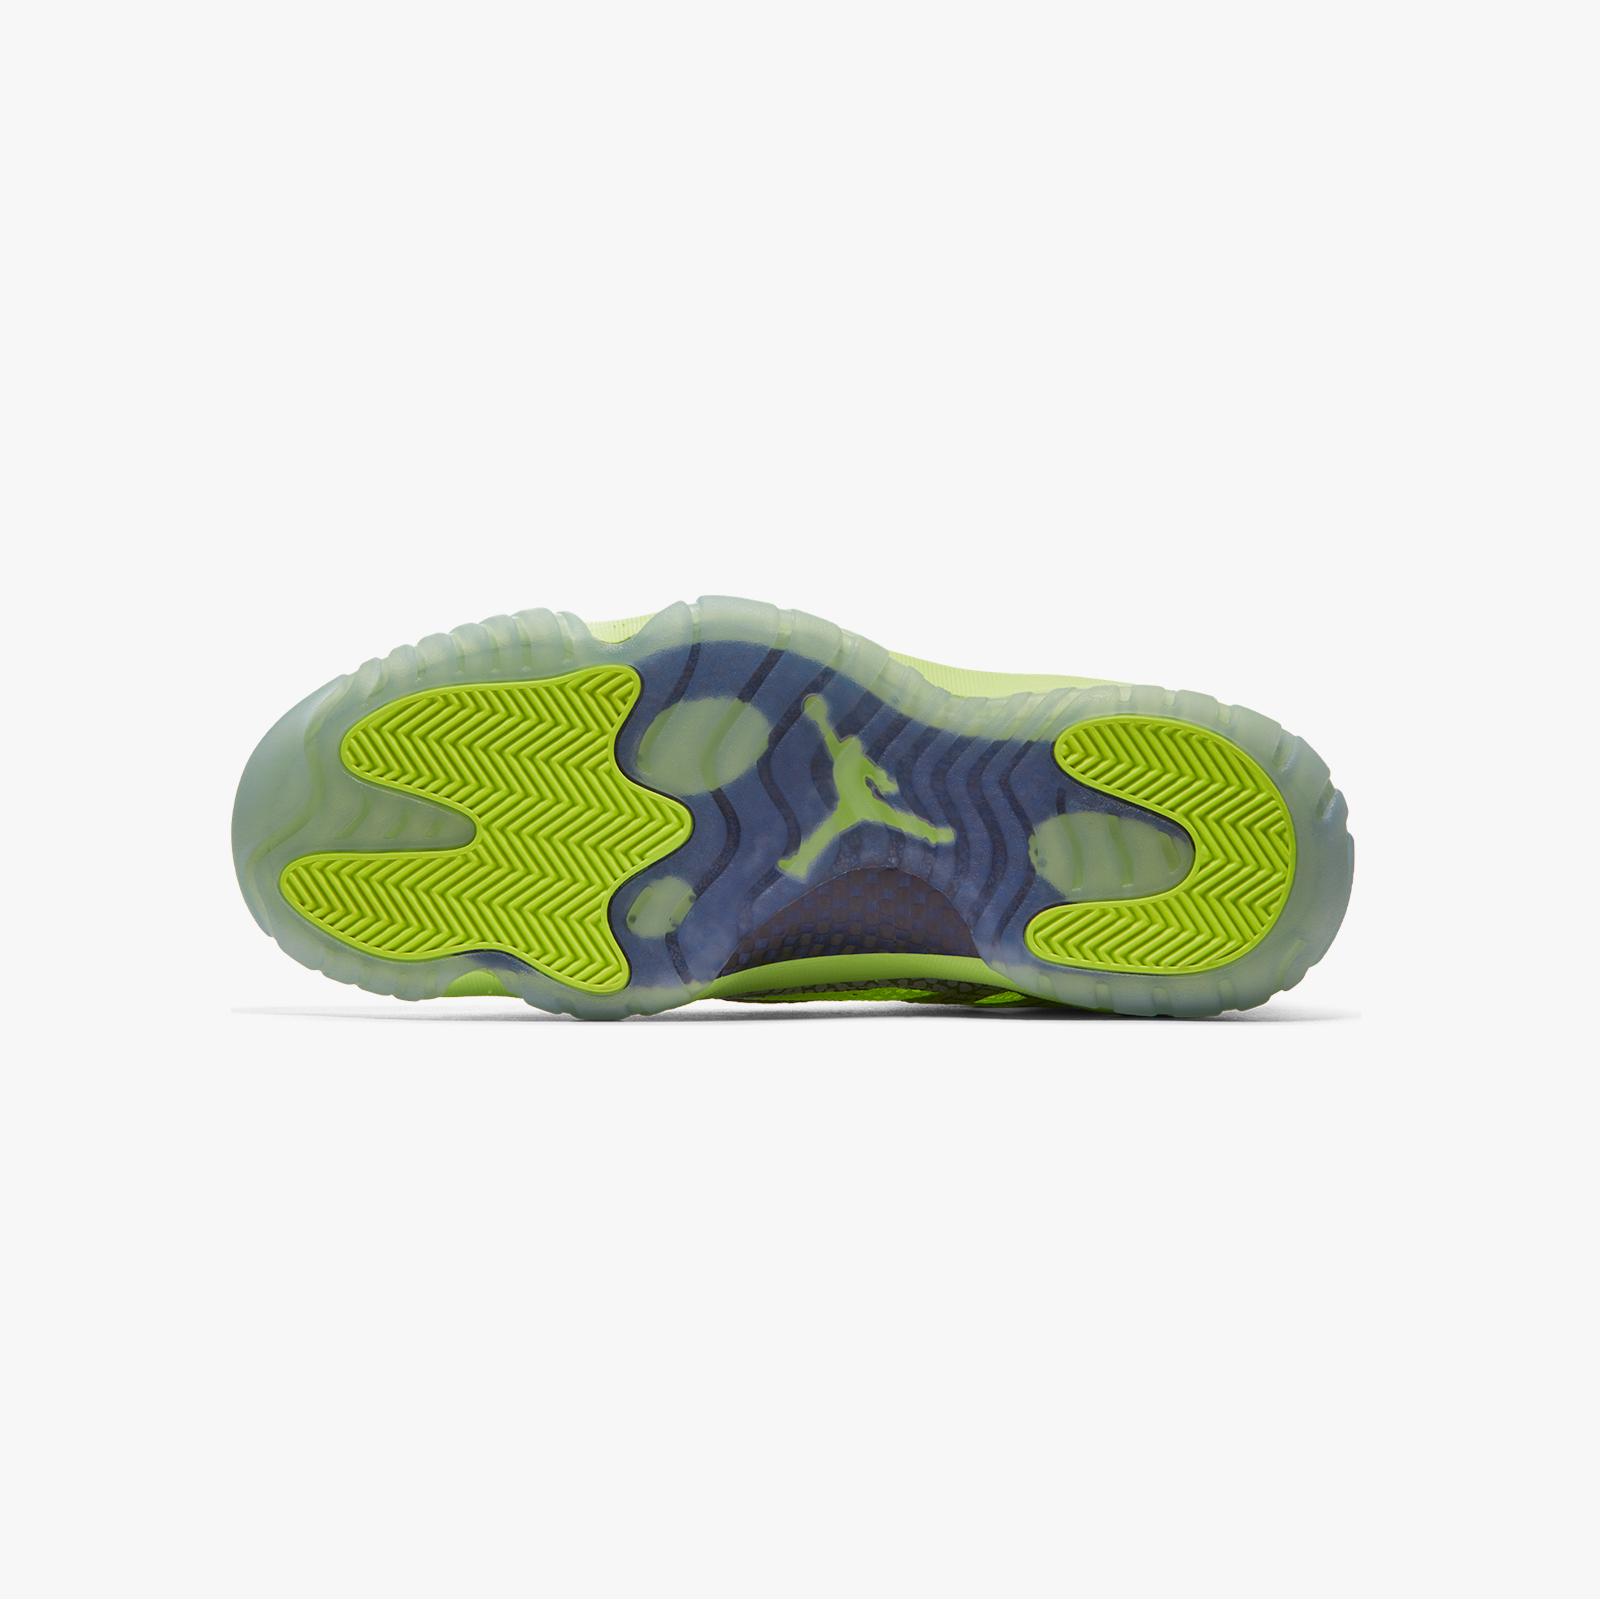 Jordan Brand Air Jordan 11 Retro IE - 919712-700 - Sneakersnstuff ... 129a265c5